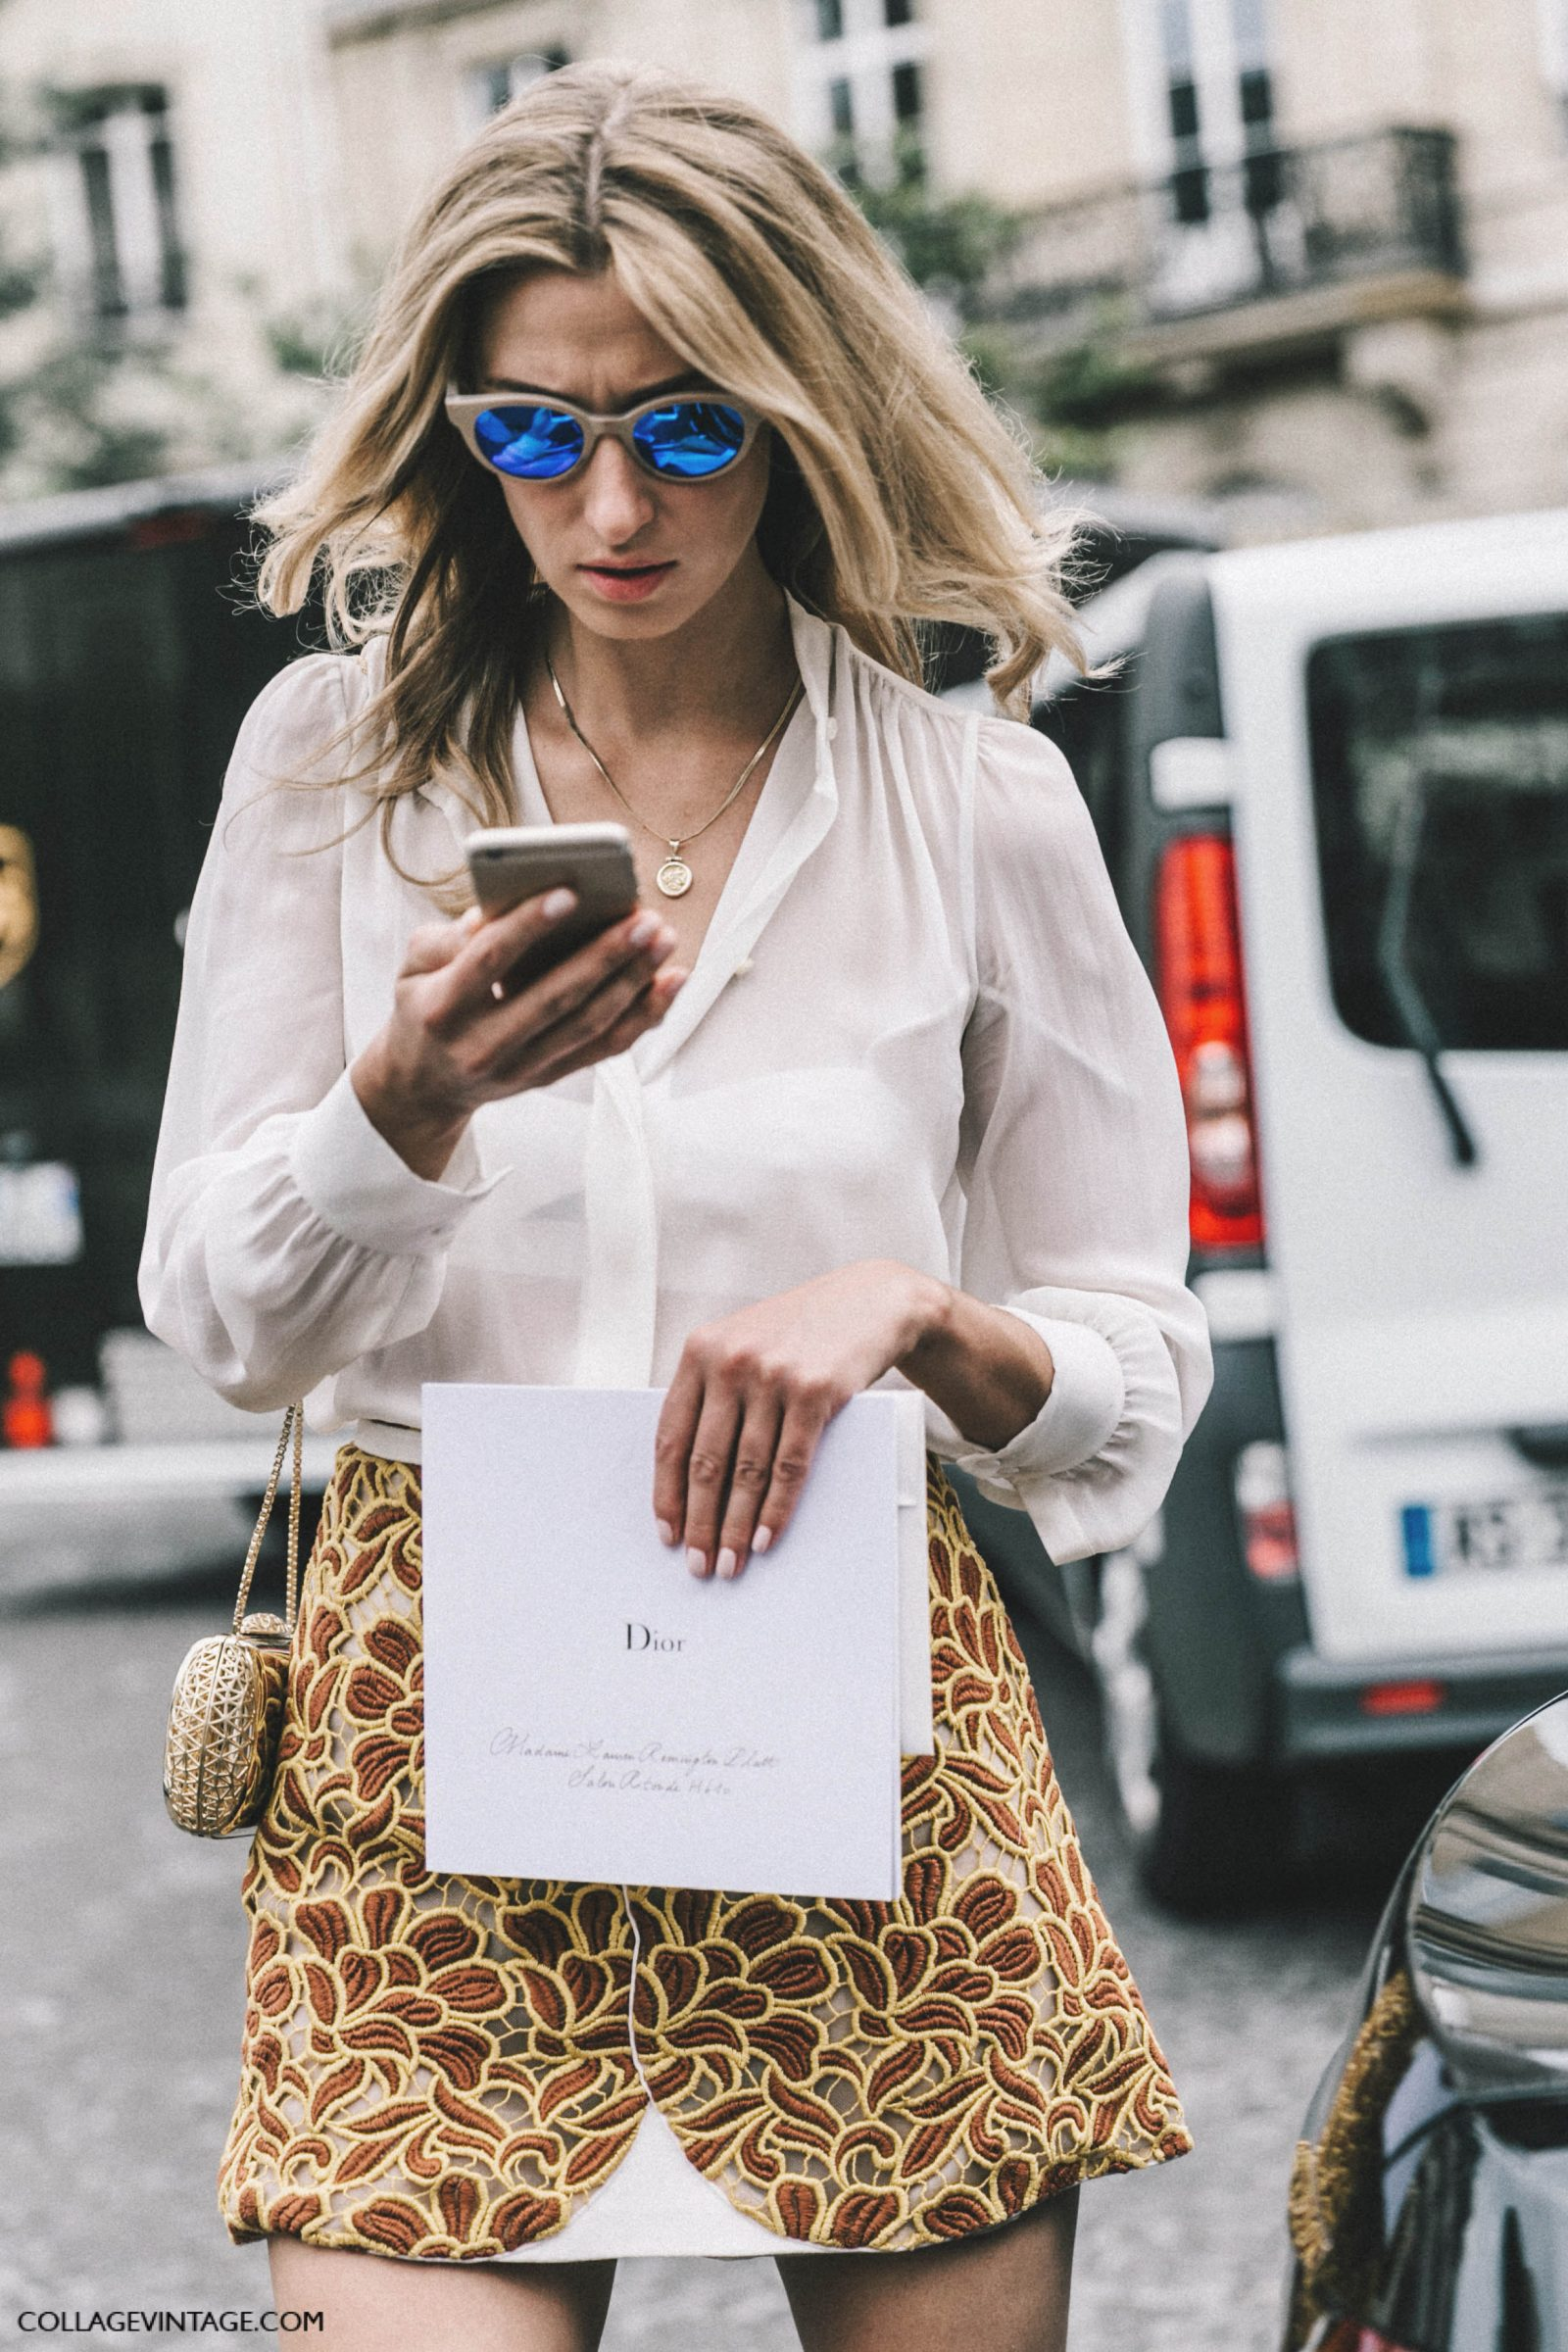 Paris_Couture_Fashion_Week-Collage_Vintage-Street_Style-123